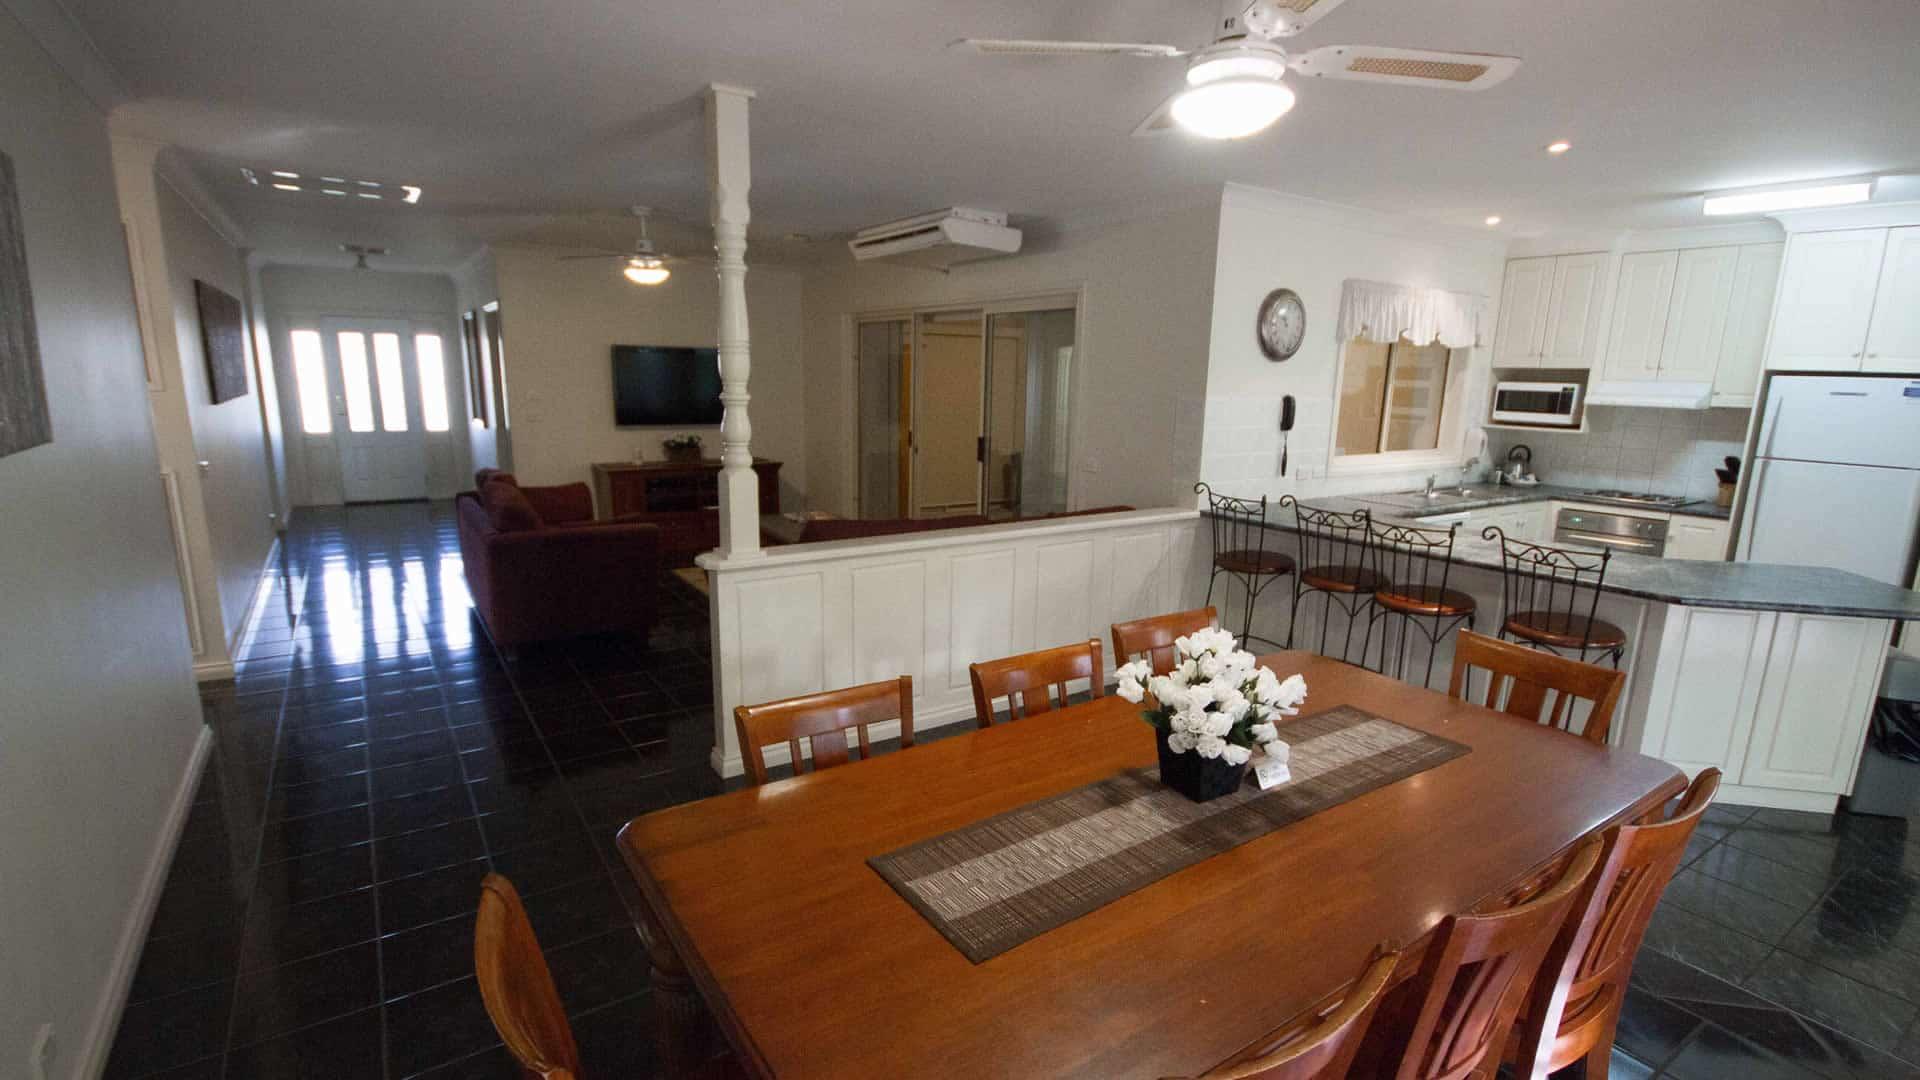 House Rental   Four Bedroom House for rent   Mildura   Sunraysia Resort